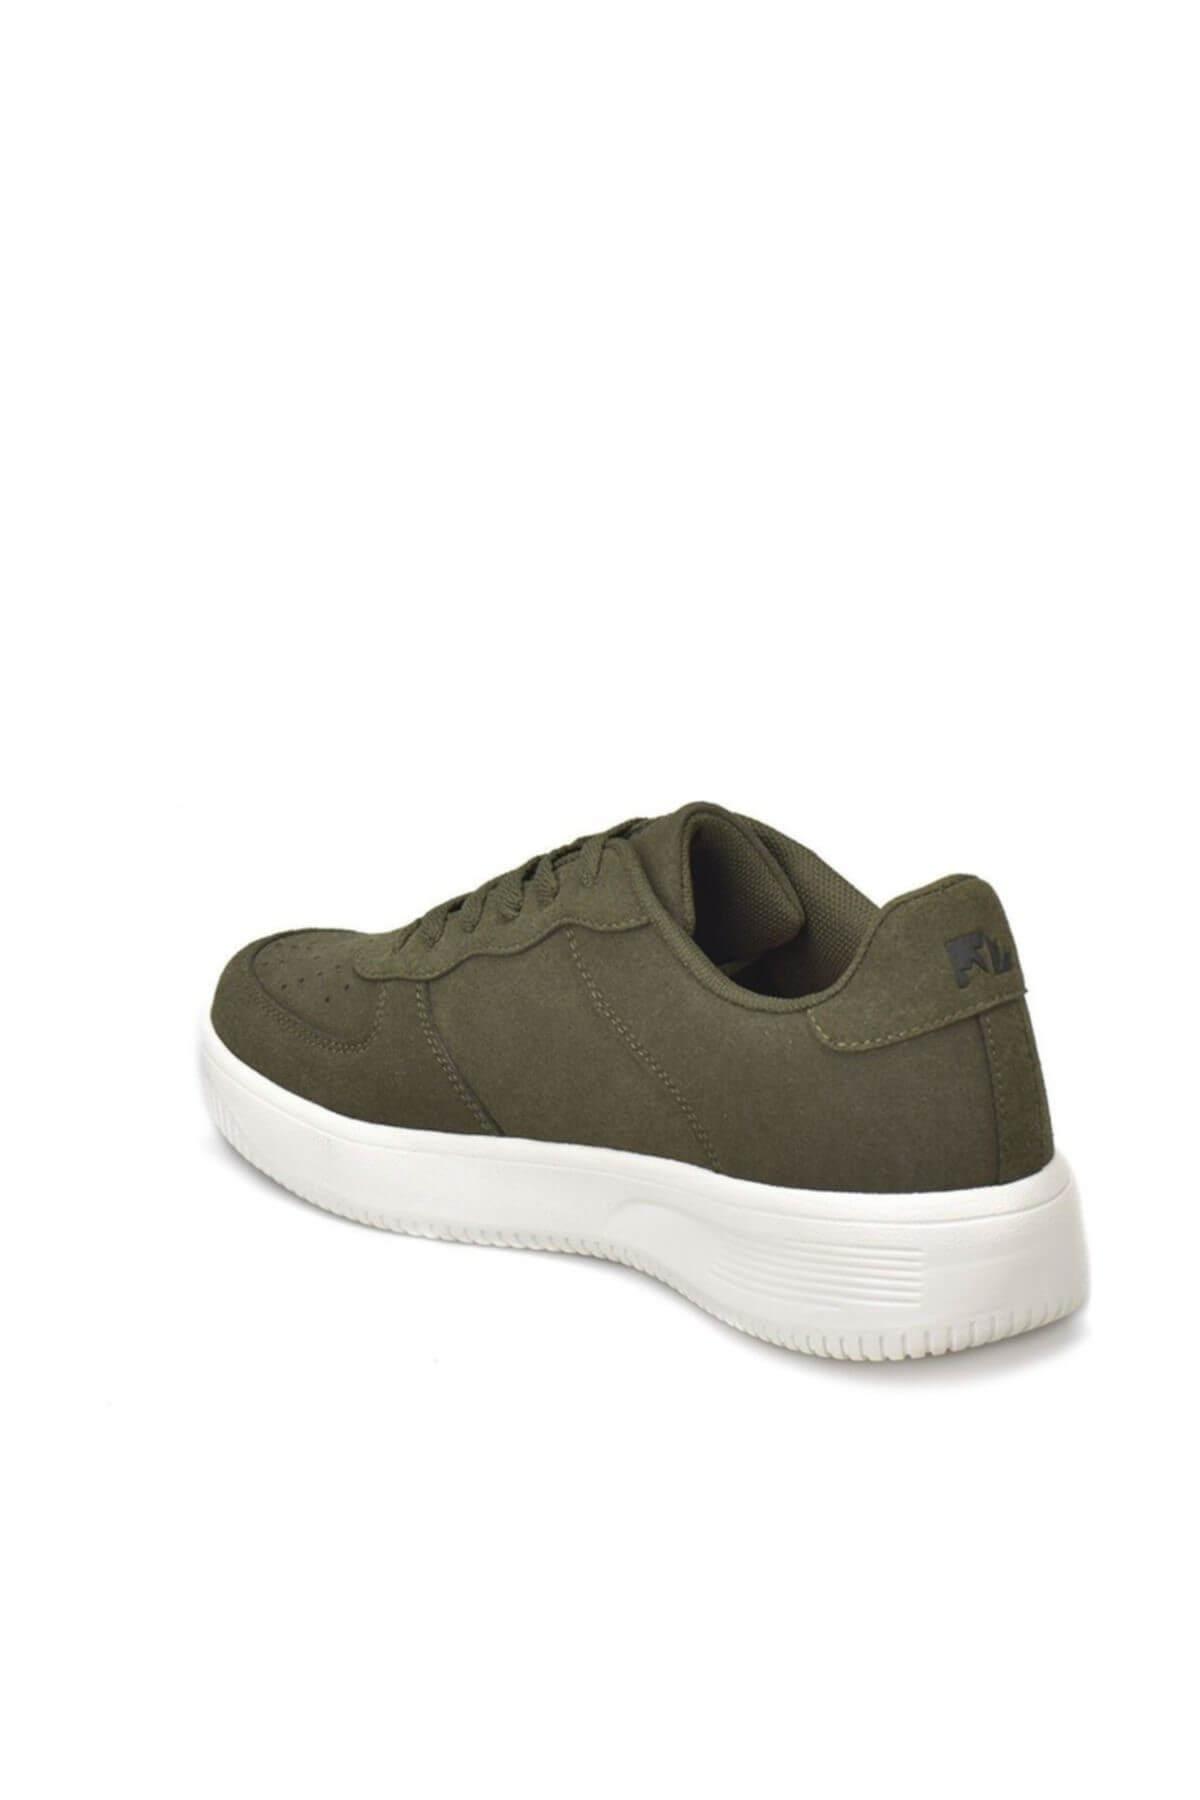 lumberjack Finster Sue Haki Erkek Sneaker Ayakkabı 100329395 2